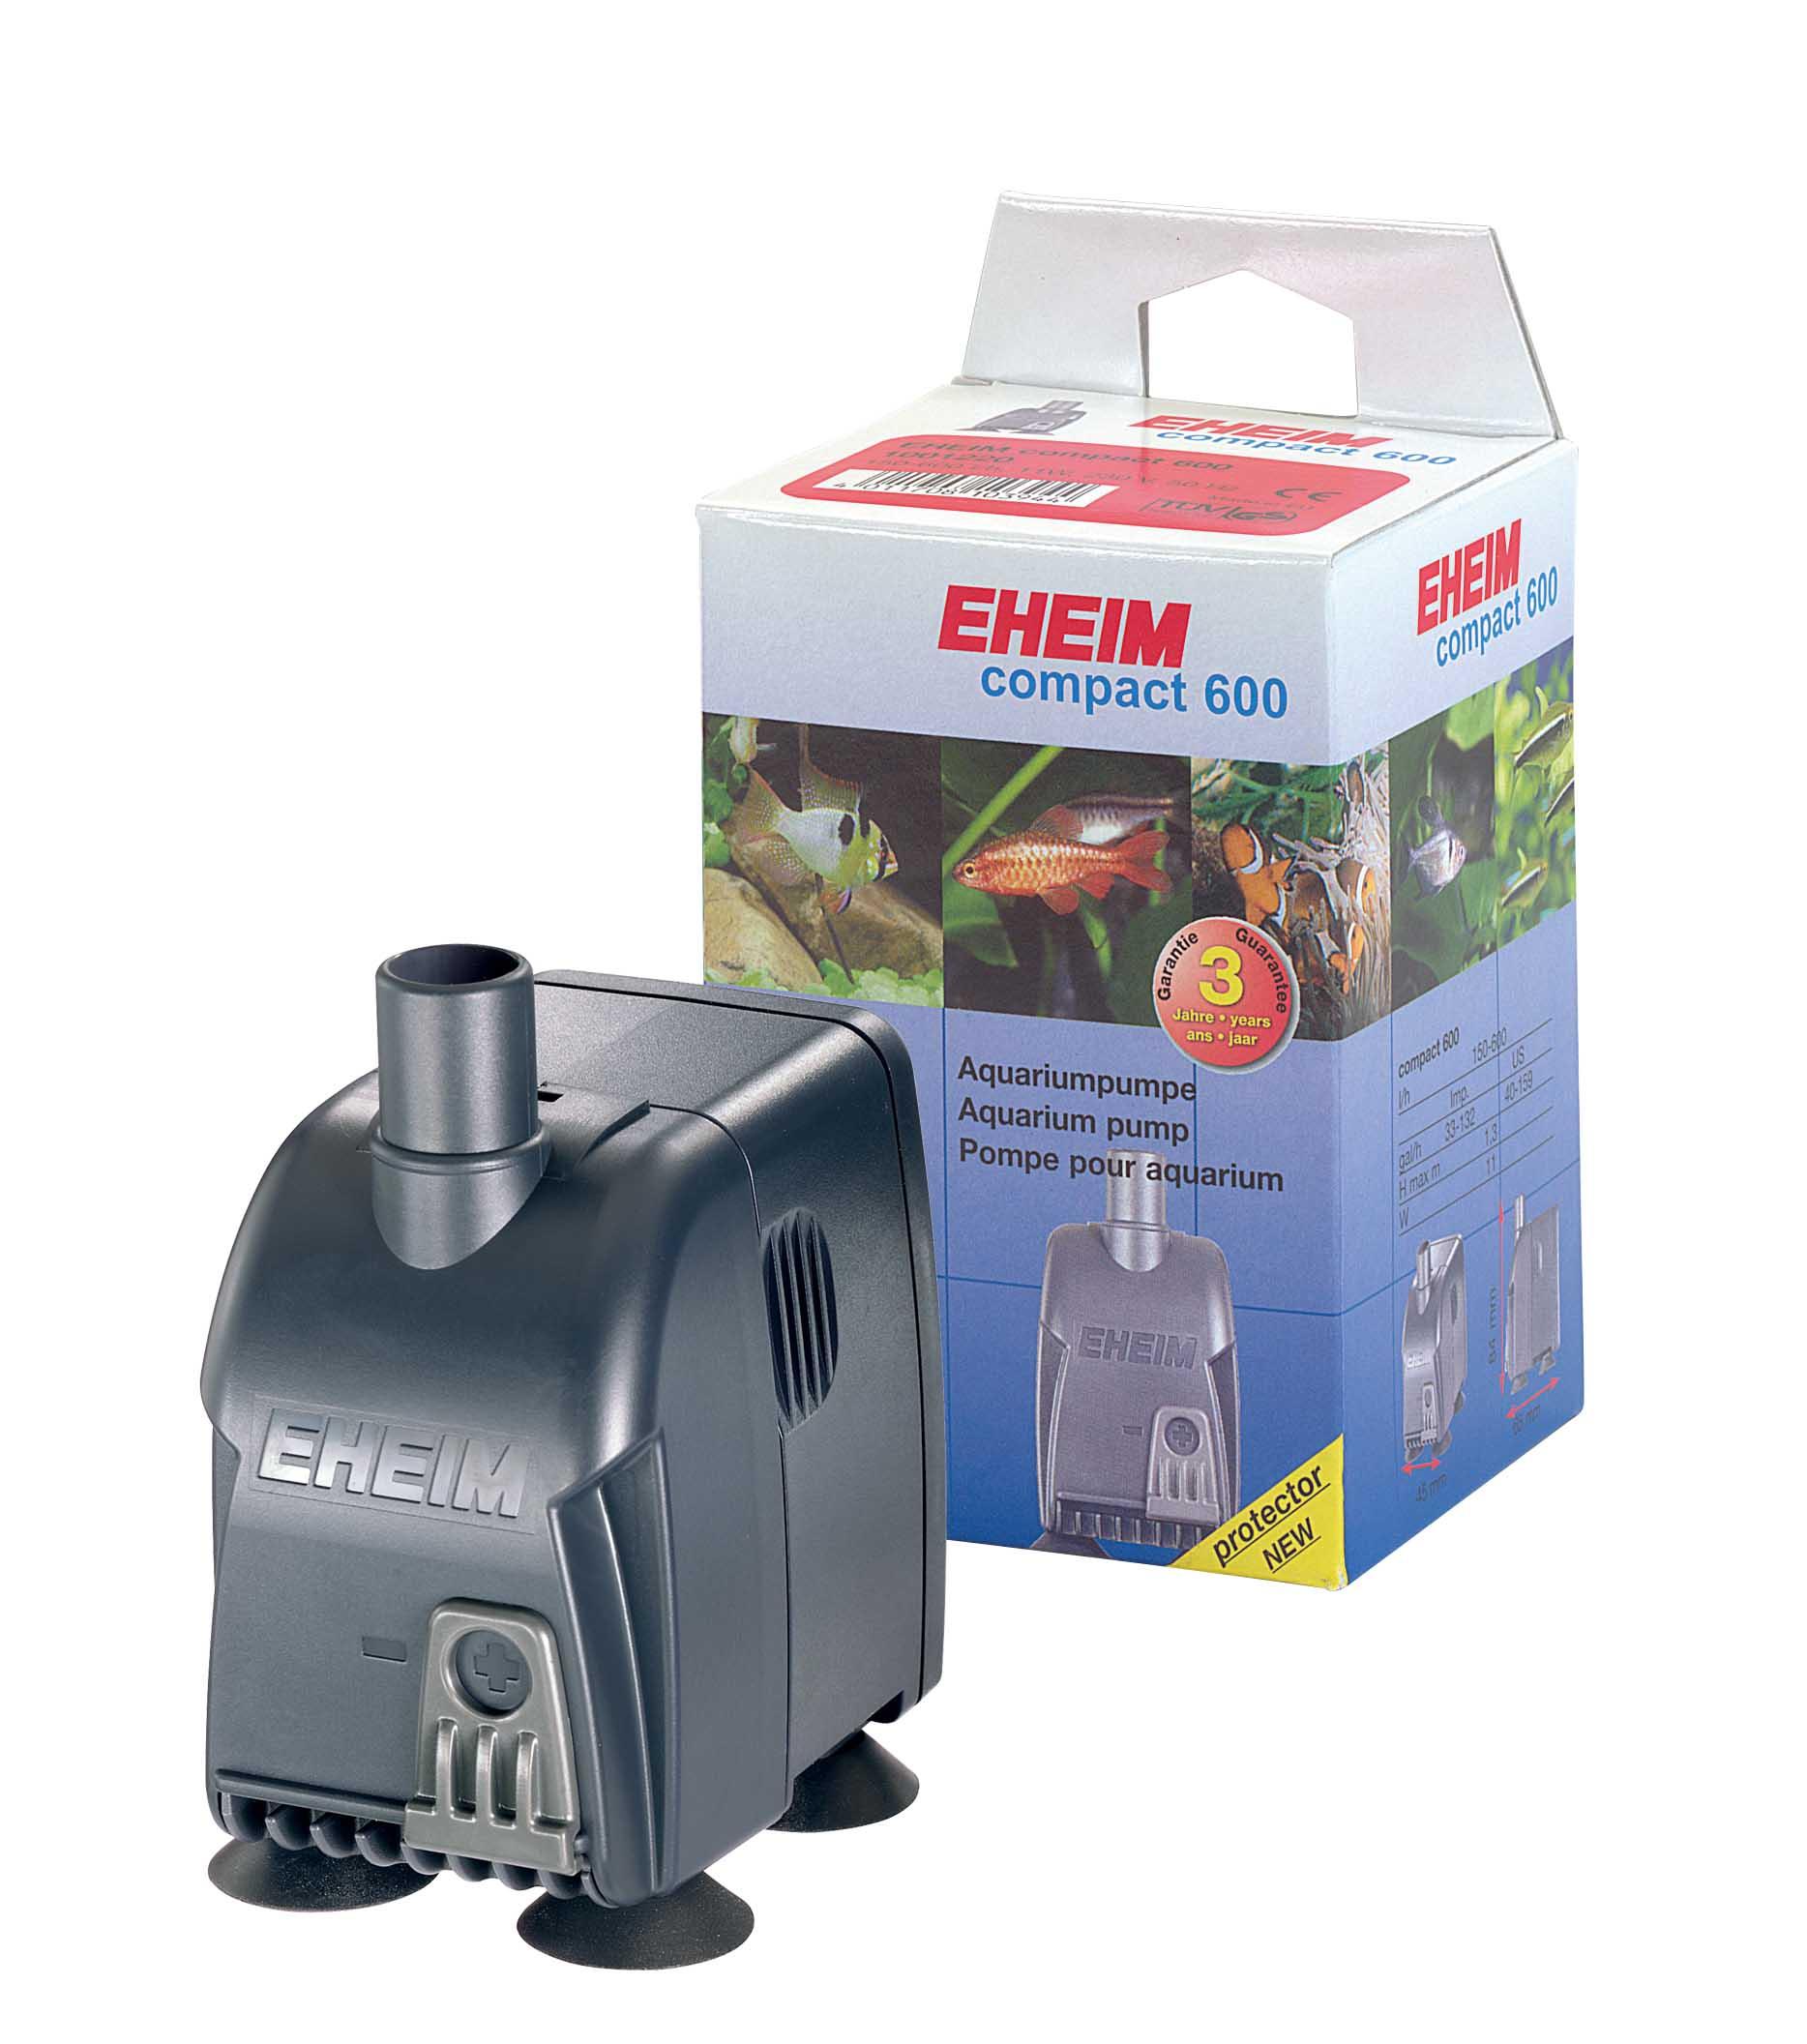 EHEIM GmbH amp; Co. KG EHEIM compact 600